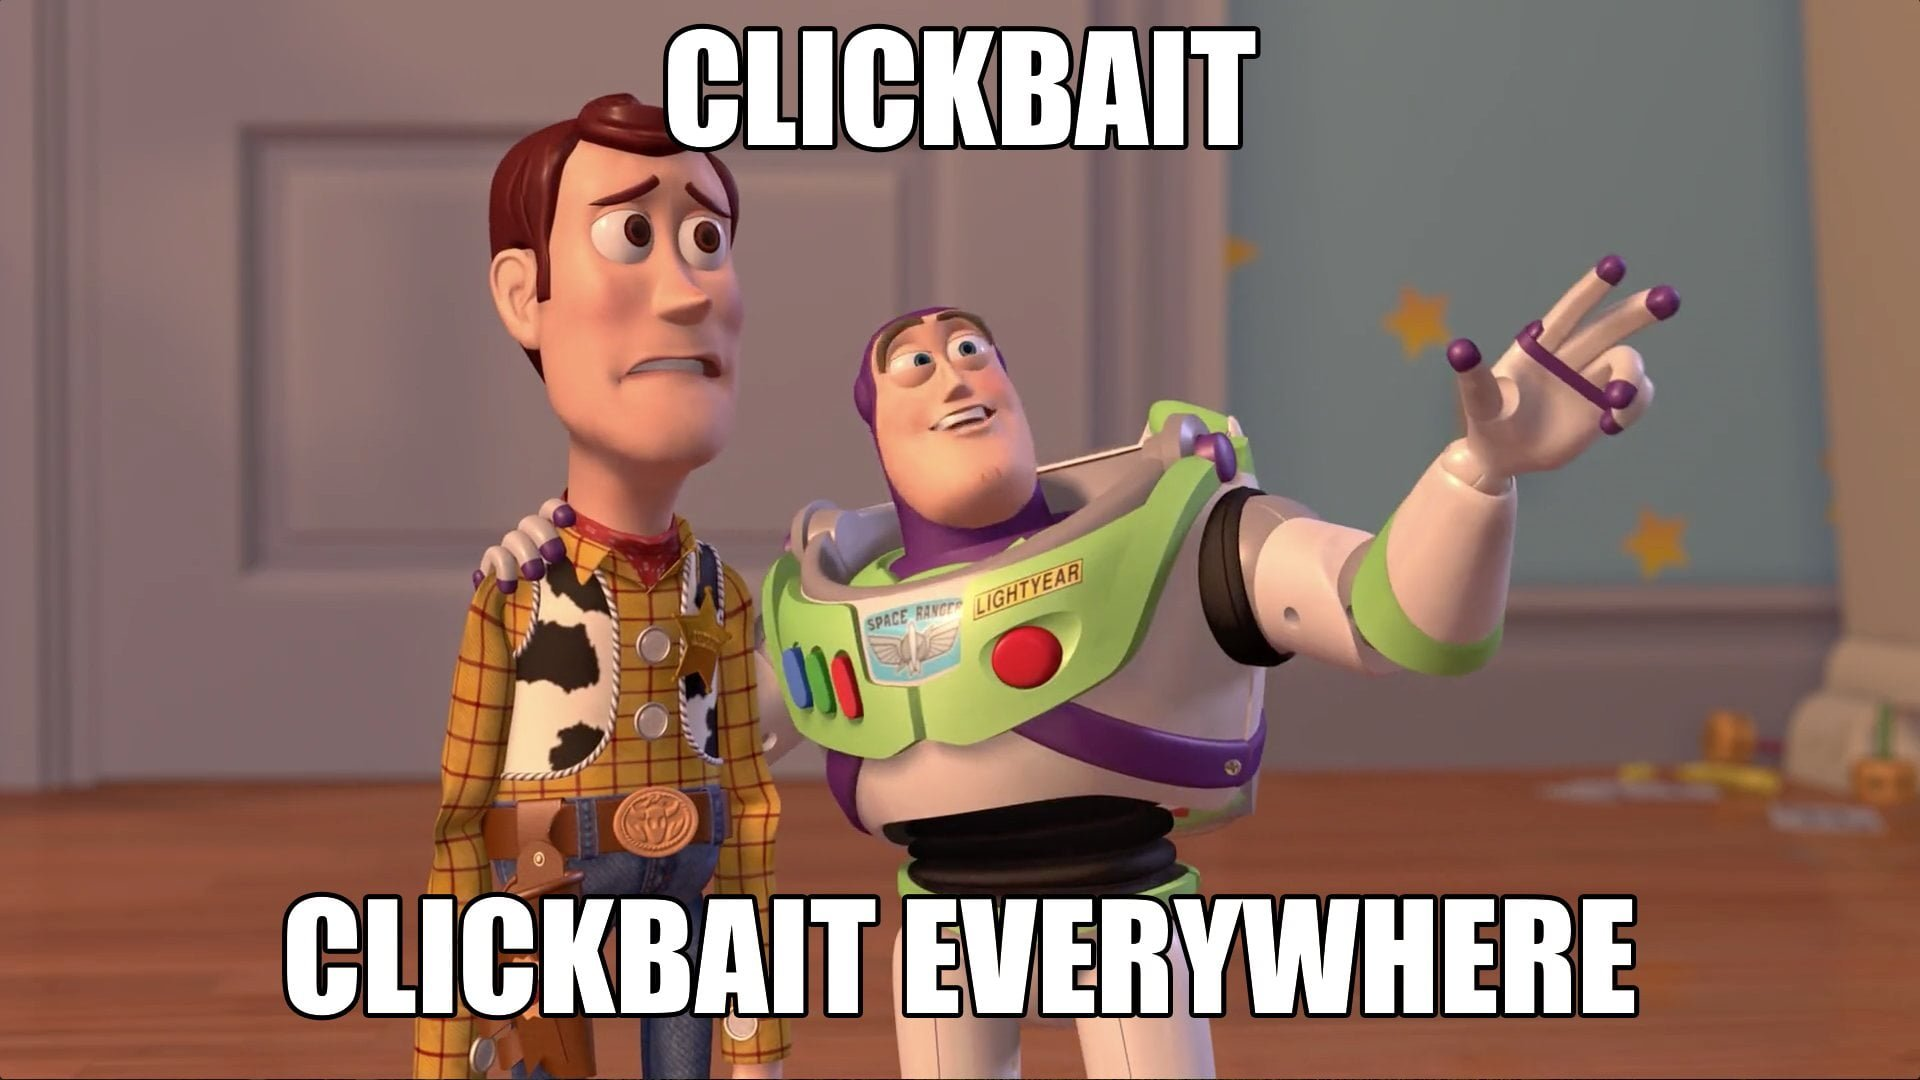 Clickbait everywhere